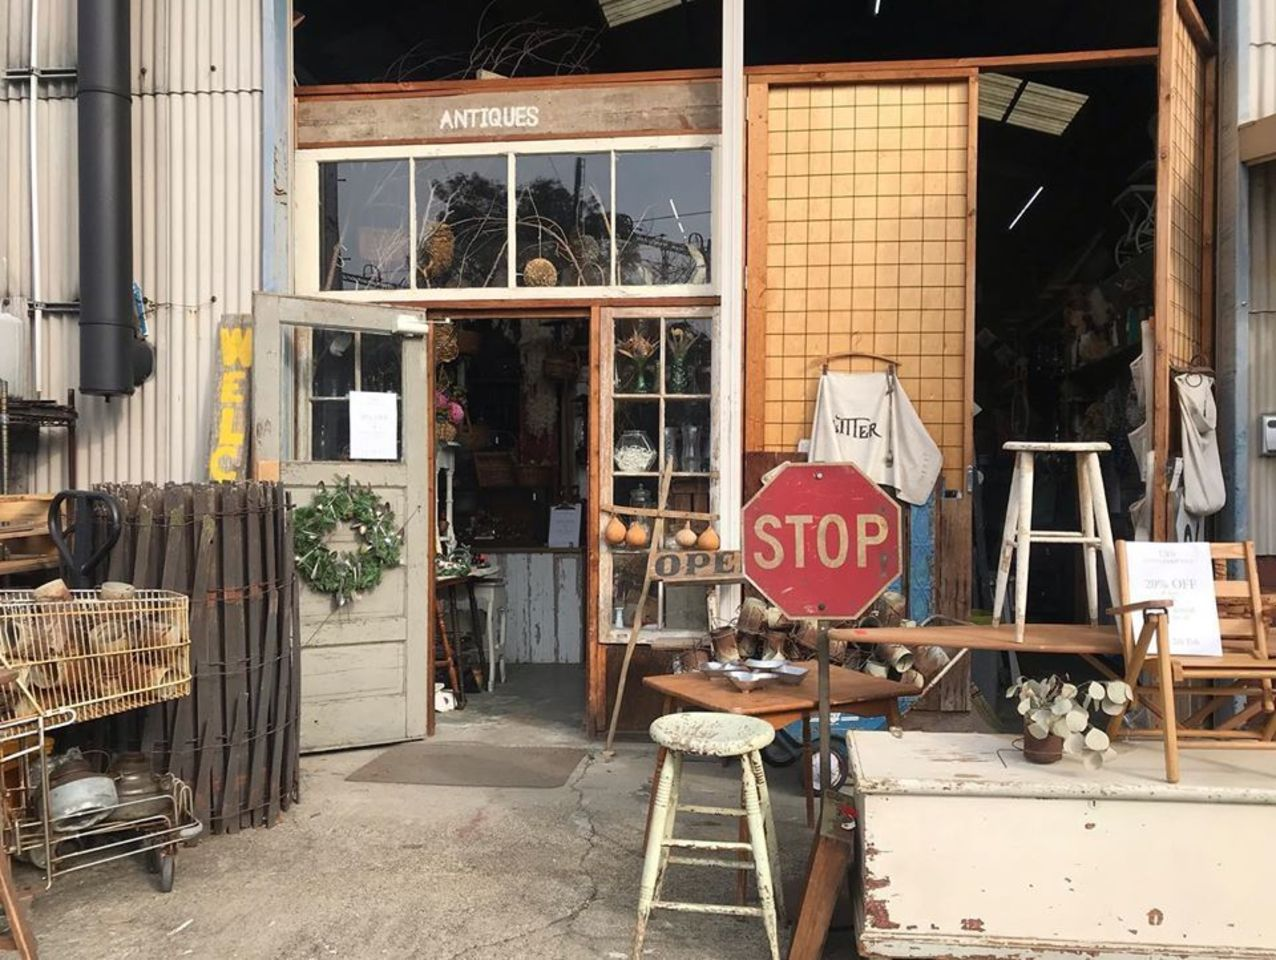 【 GLITTER 】アンティーク雑貨(名古屋市中川区)